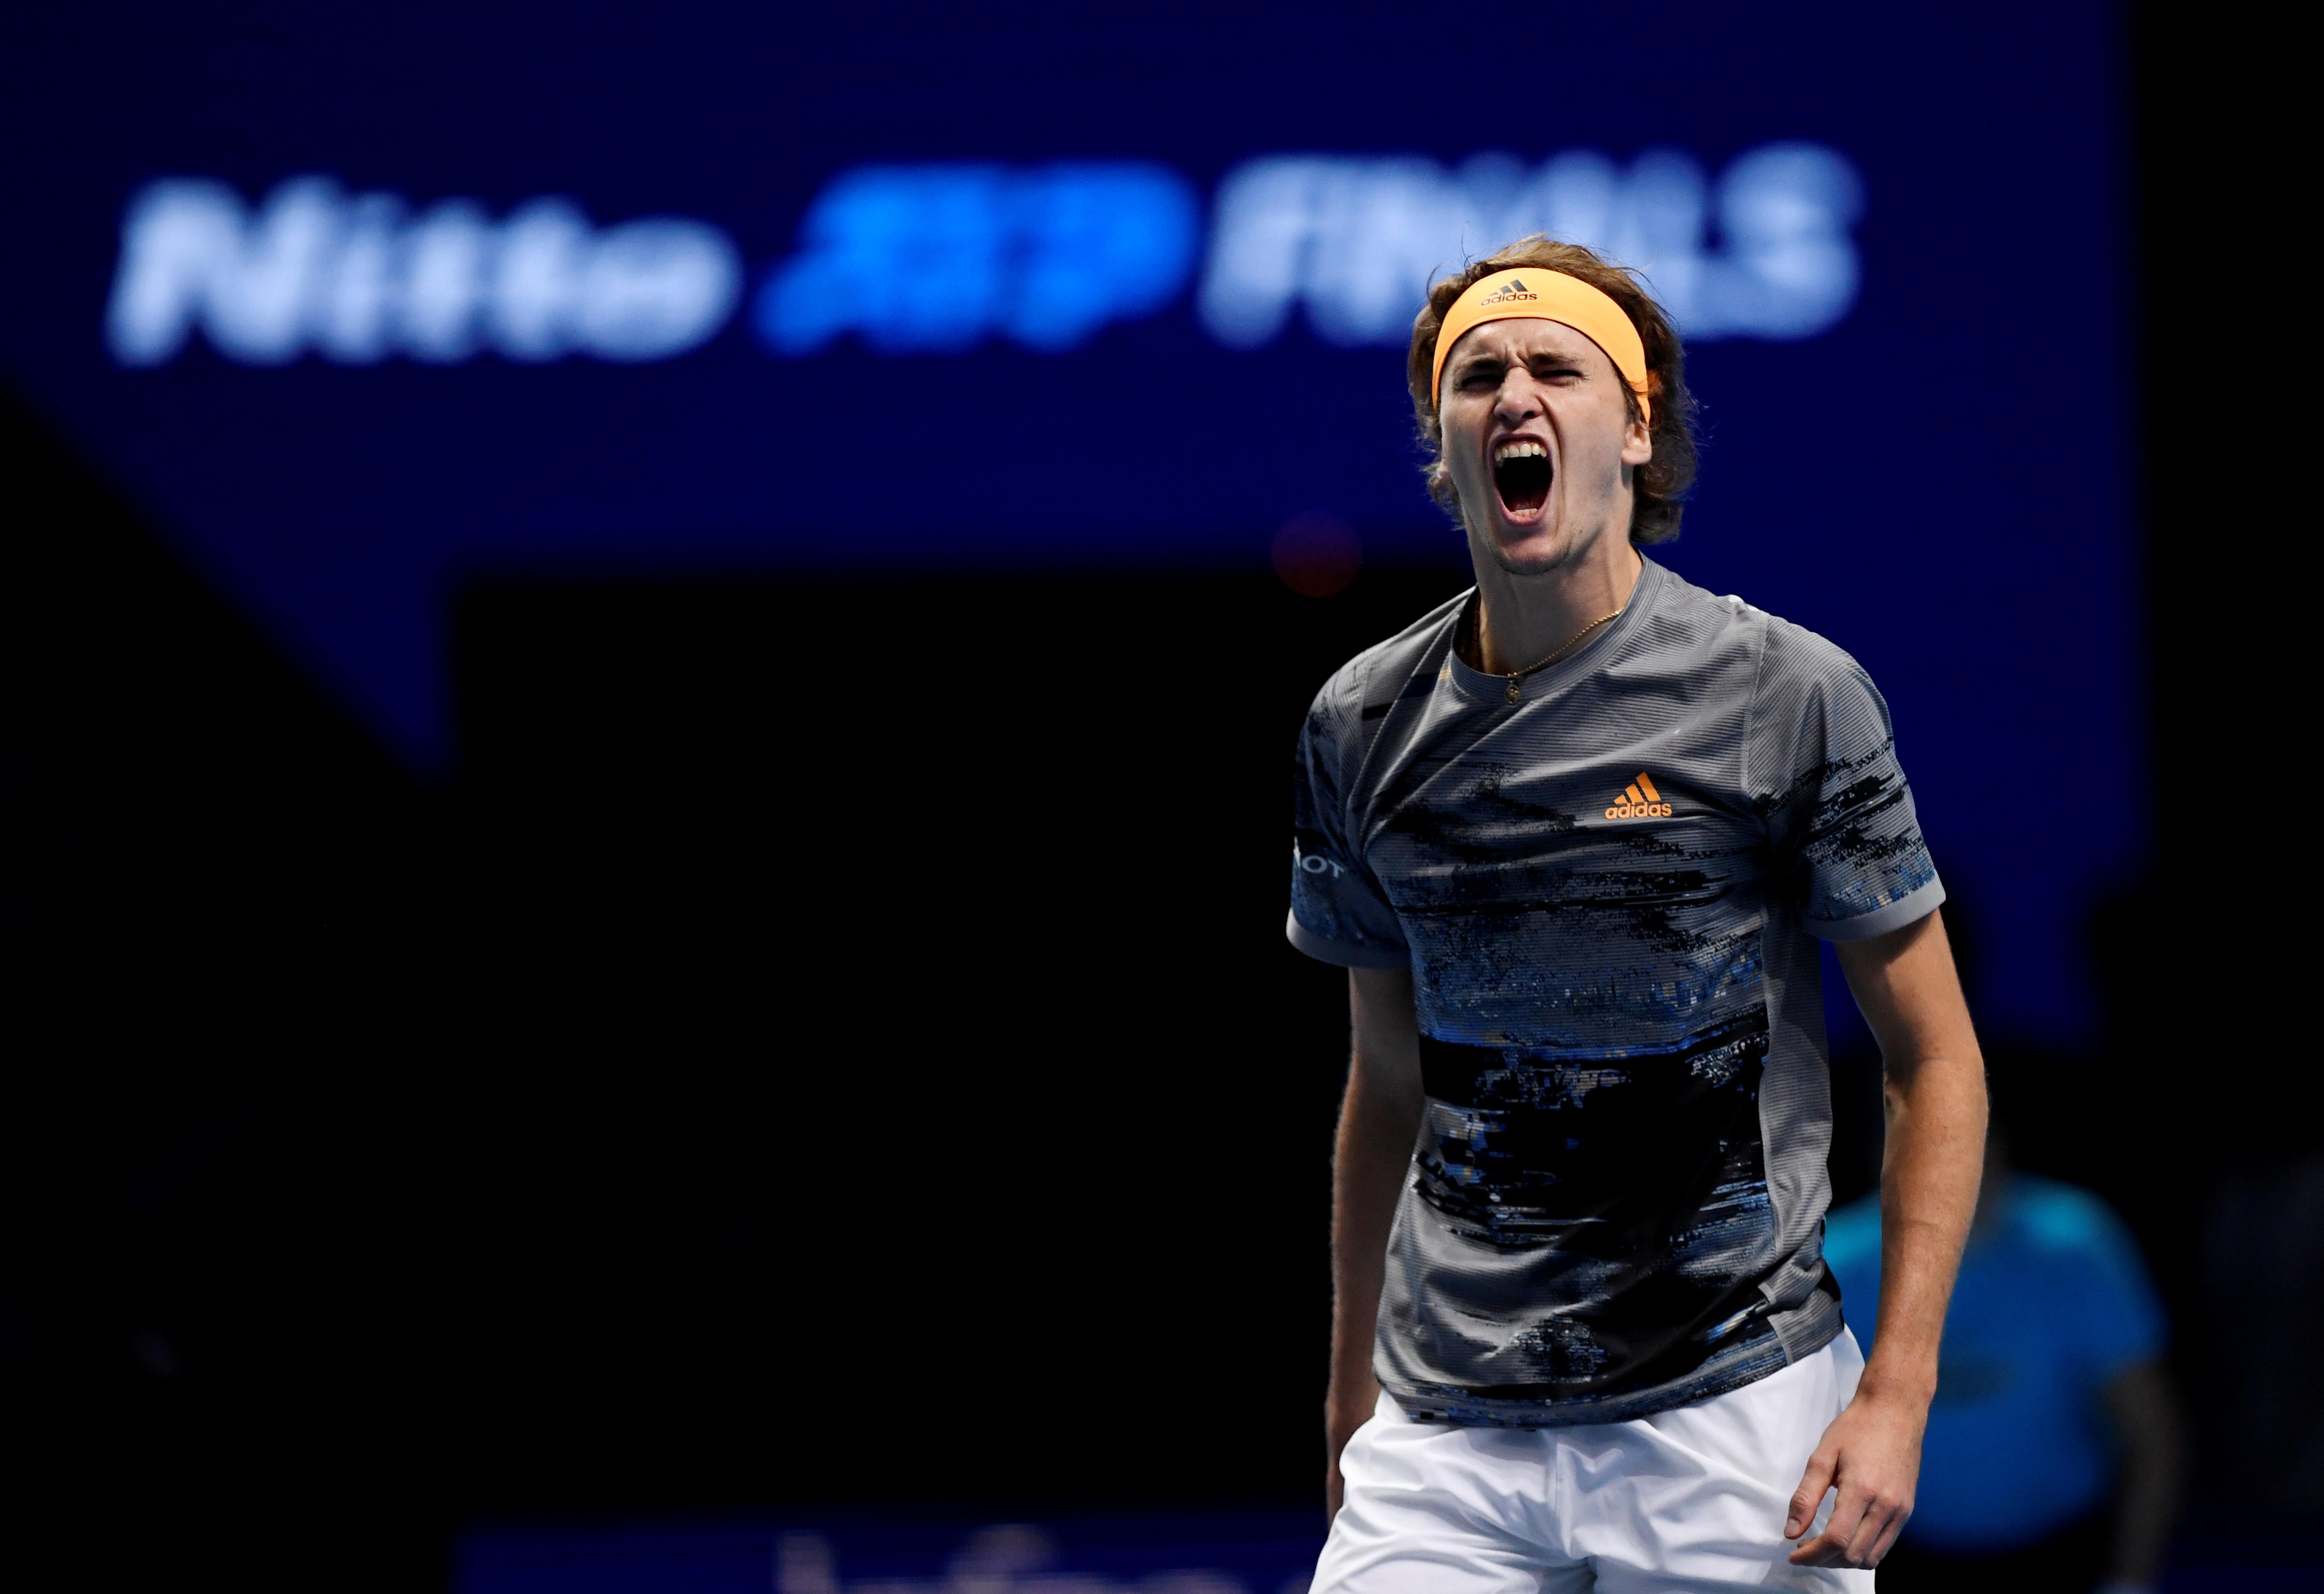 Sparkling Zverev tastes first victory over Nadal